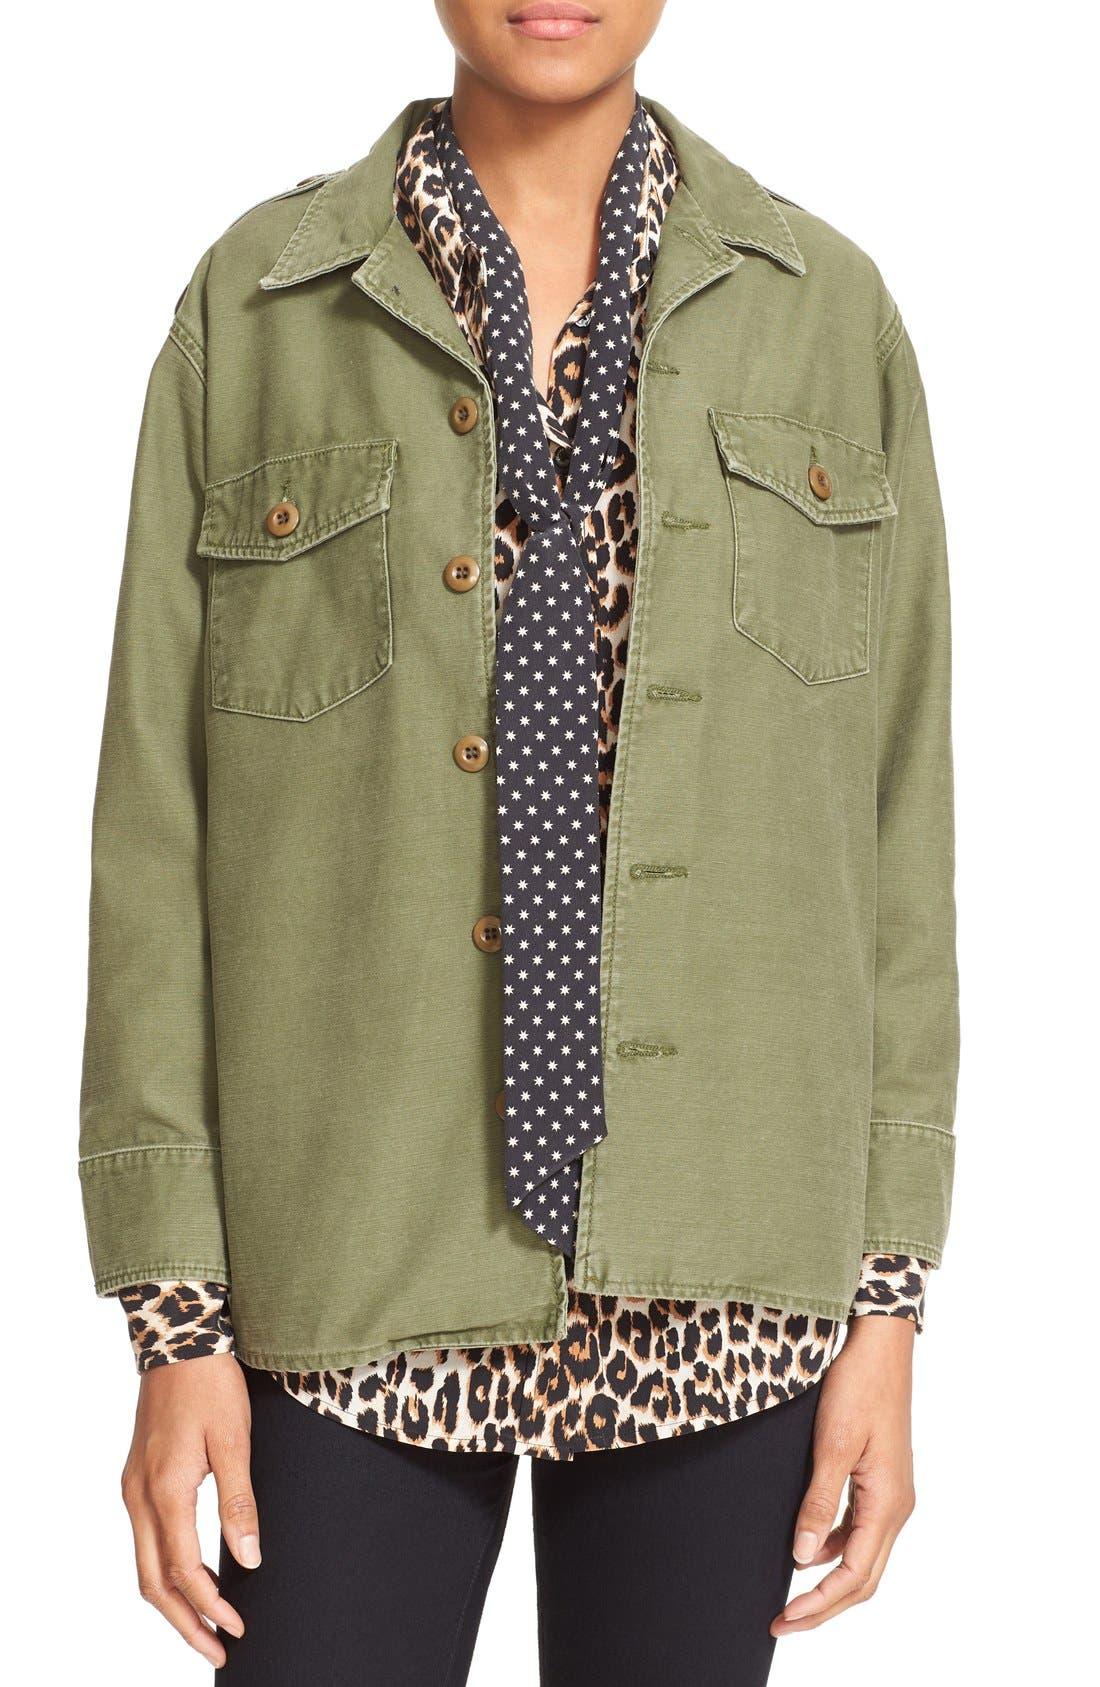 Main Image - Kate Moss for Equipment 'Major' Shirt Jacket